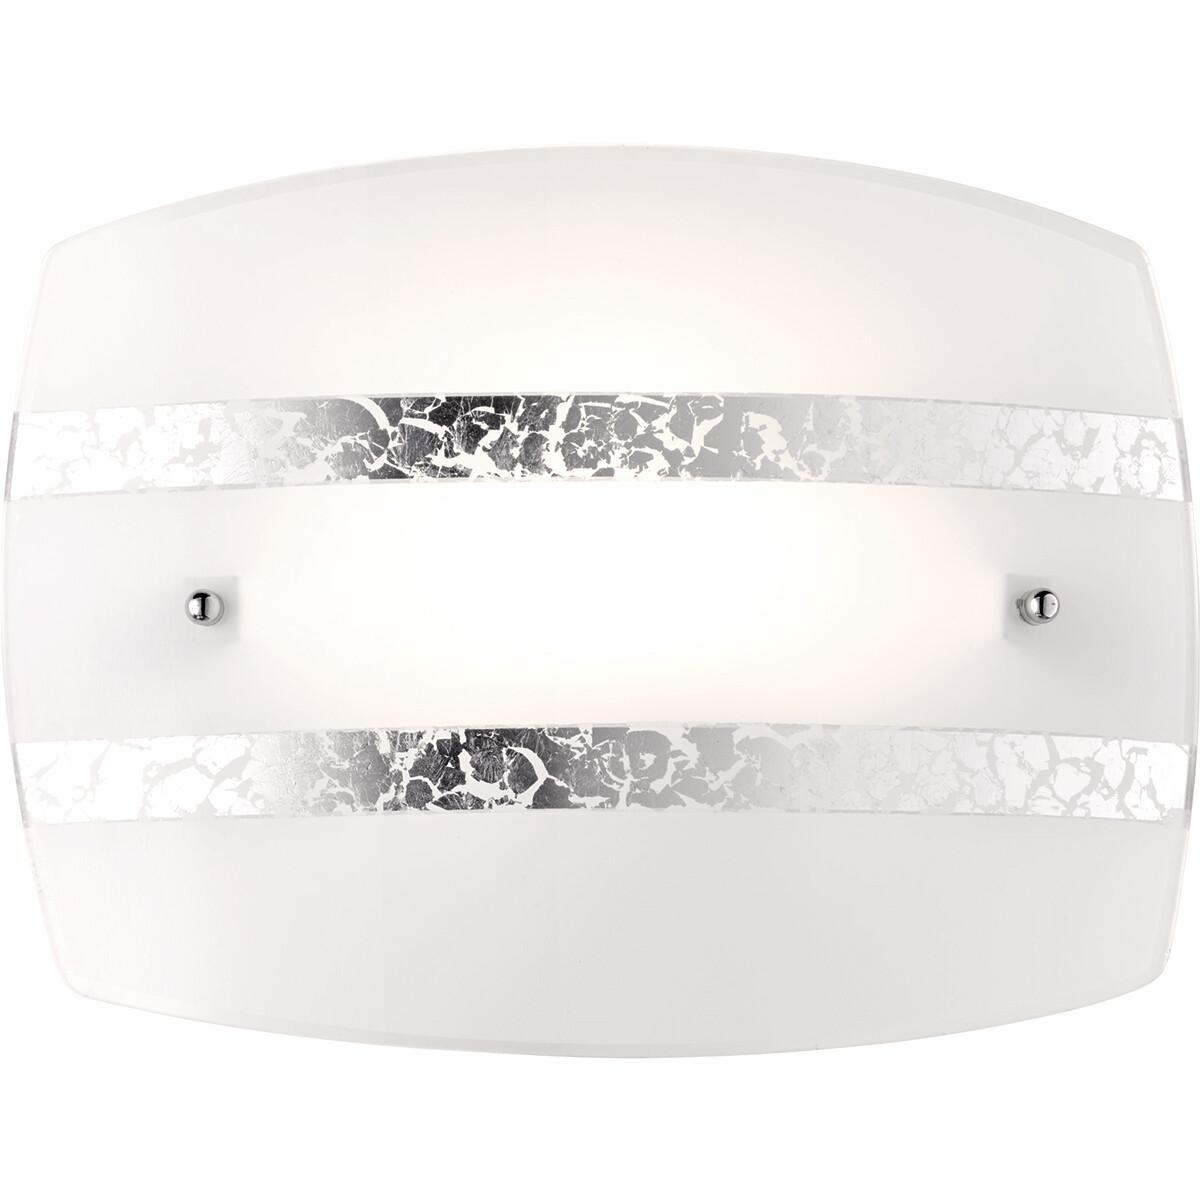 LED Wandlamp - Wandverlichting - Trion Niki - E27 Fitting - Rond - Mat Zilver - Glas